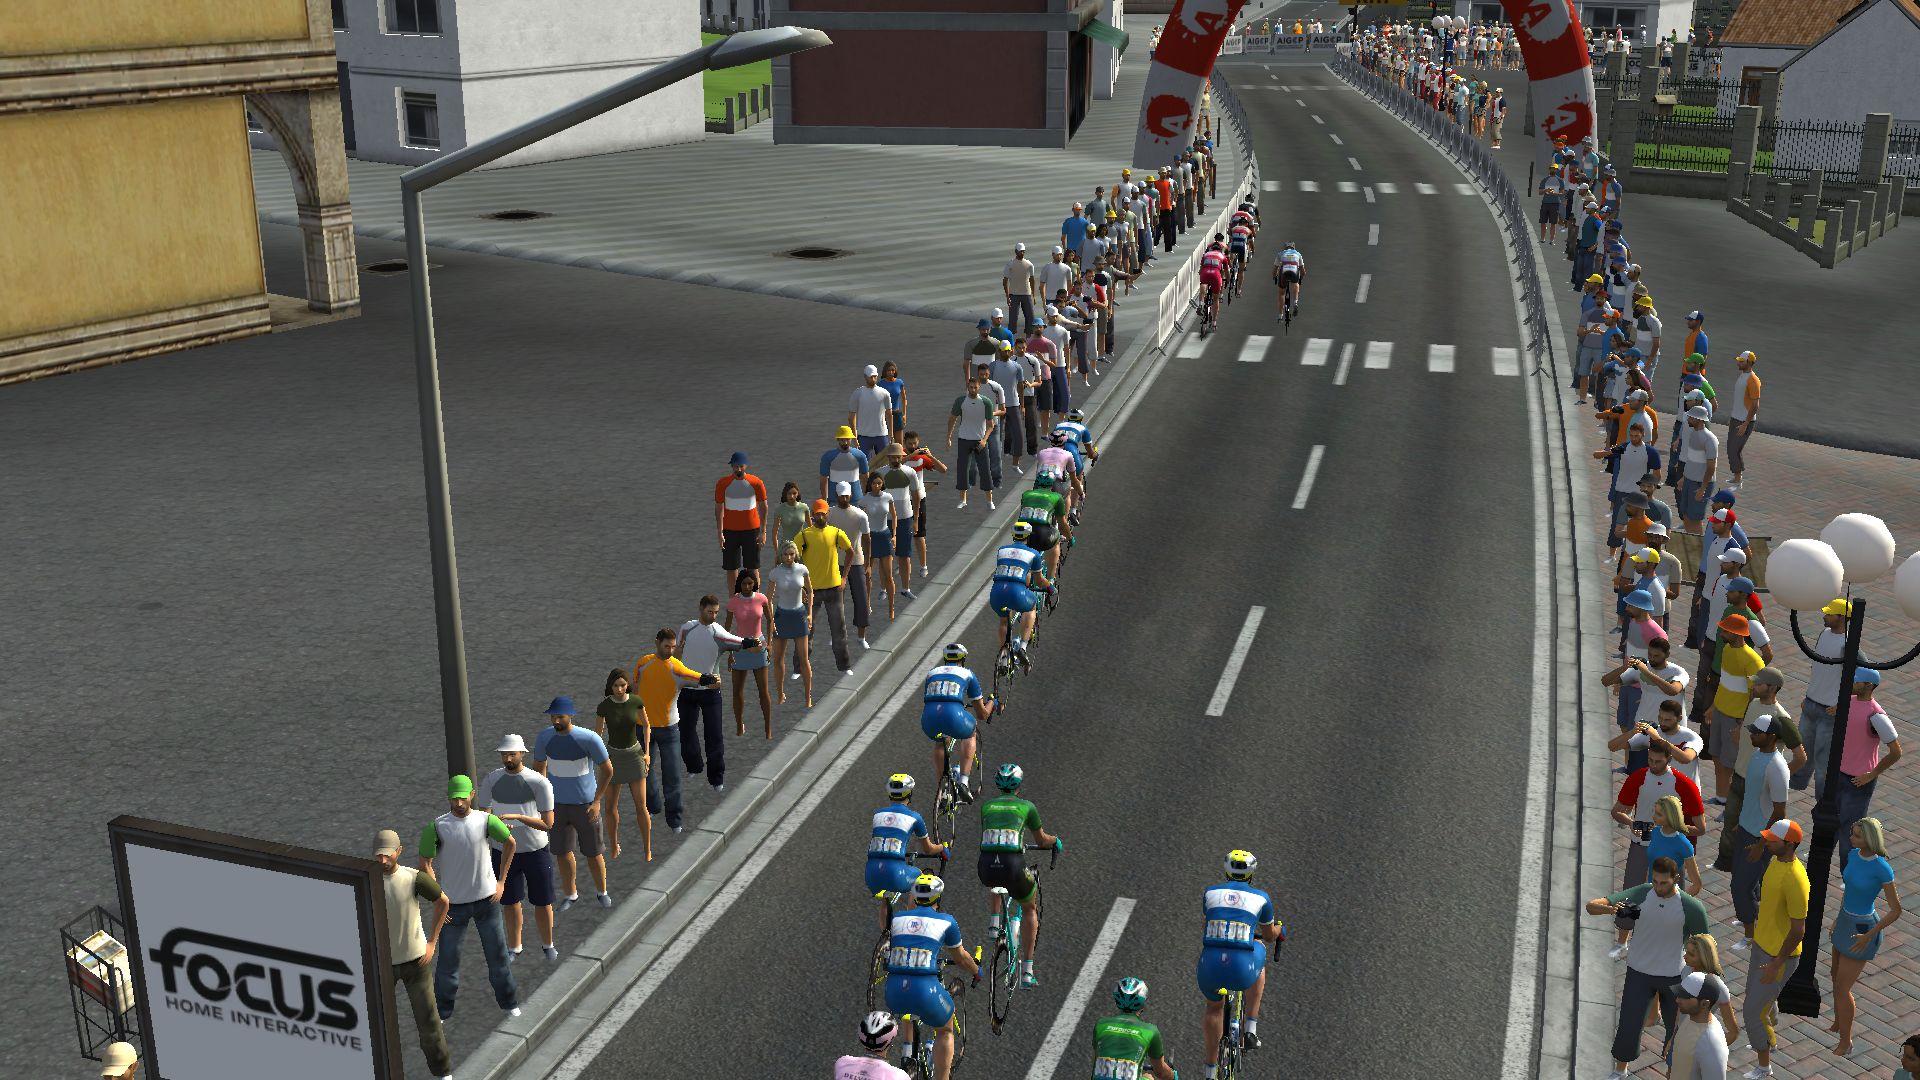 pcmdaily.com/images/mg/2019/Races/C1/TdU/mg19_tdu_06_PCM0210.jpg